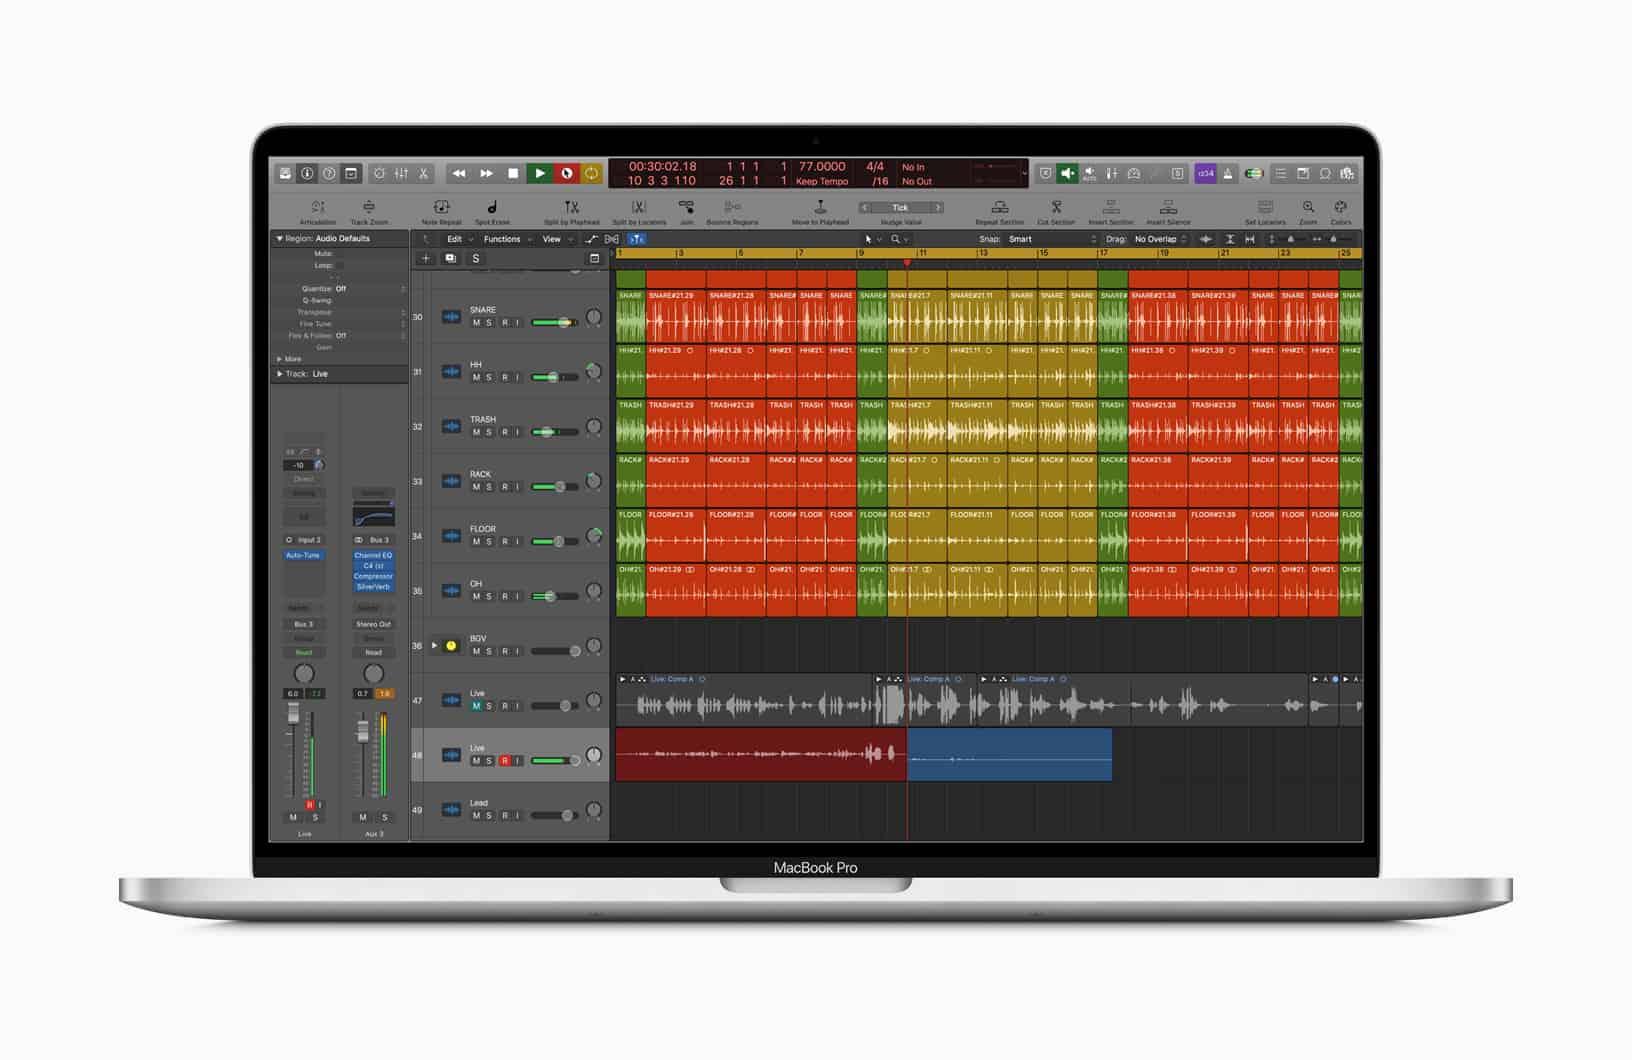 laptopvang.com-macbook-pro-2019-16-inch-mvvk2-cpu-memory-performance